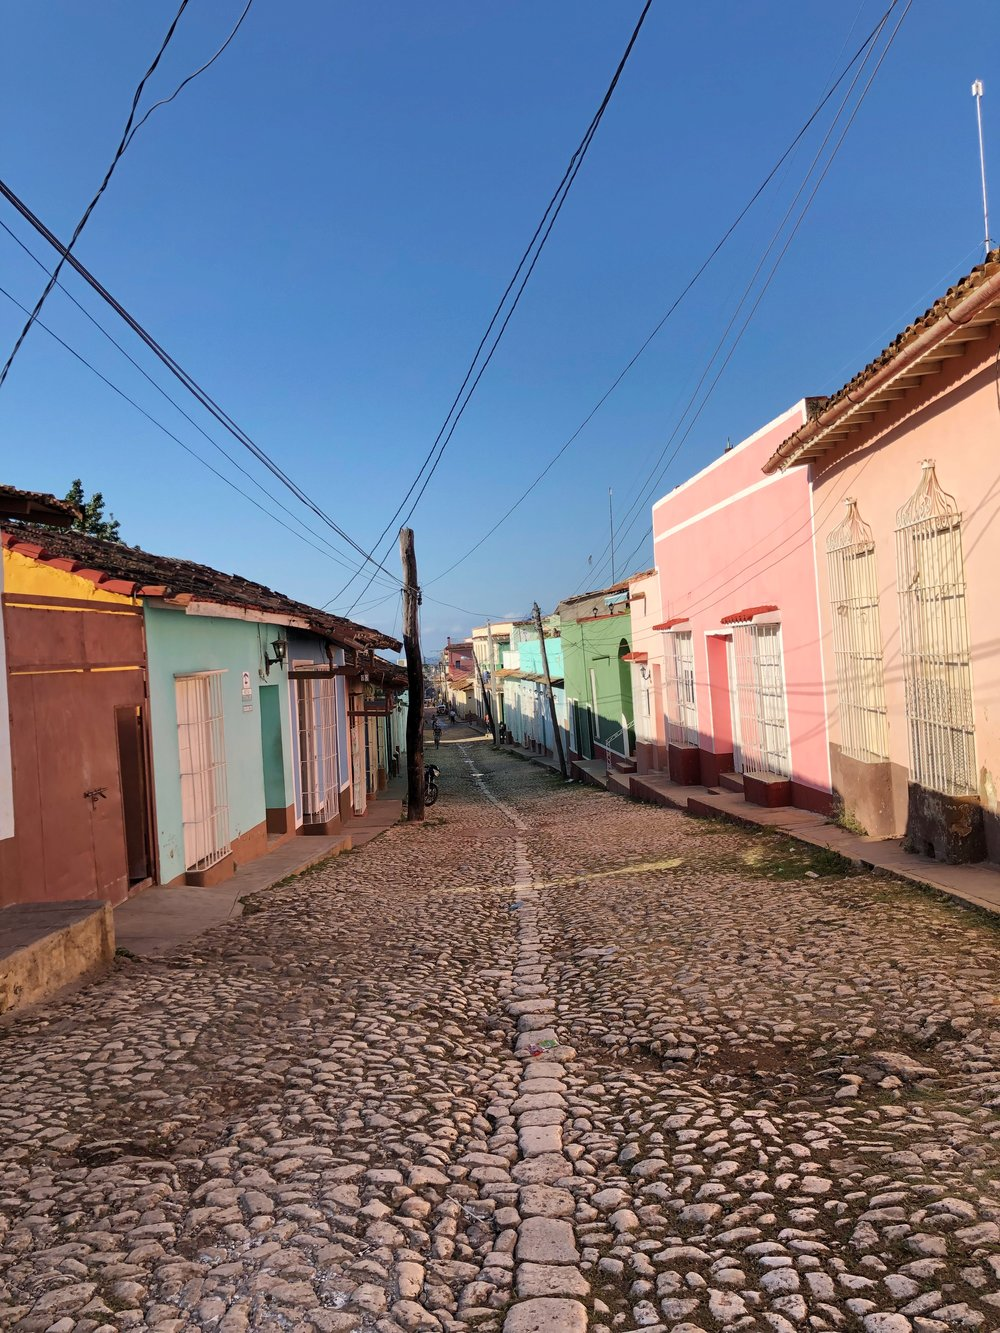 The cobblestone streets of Trinidad